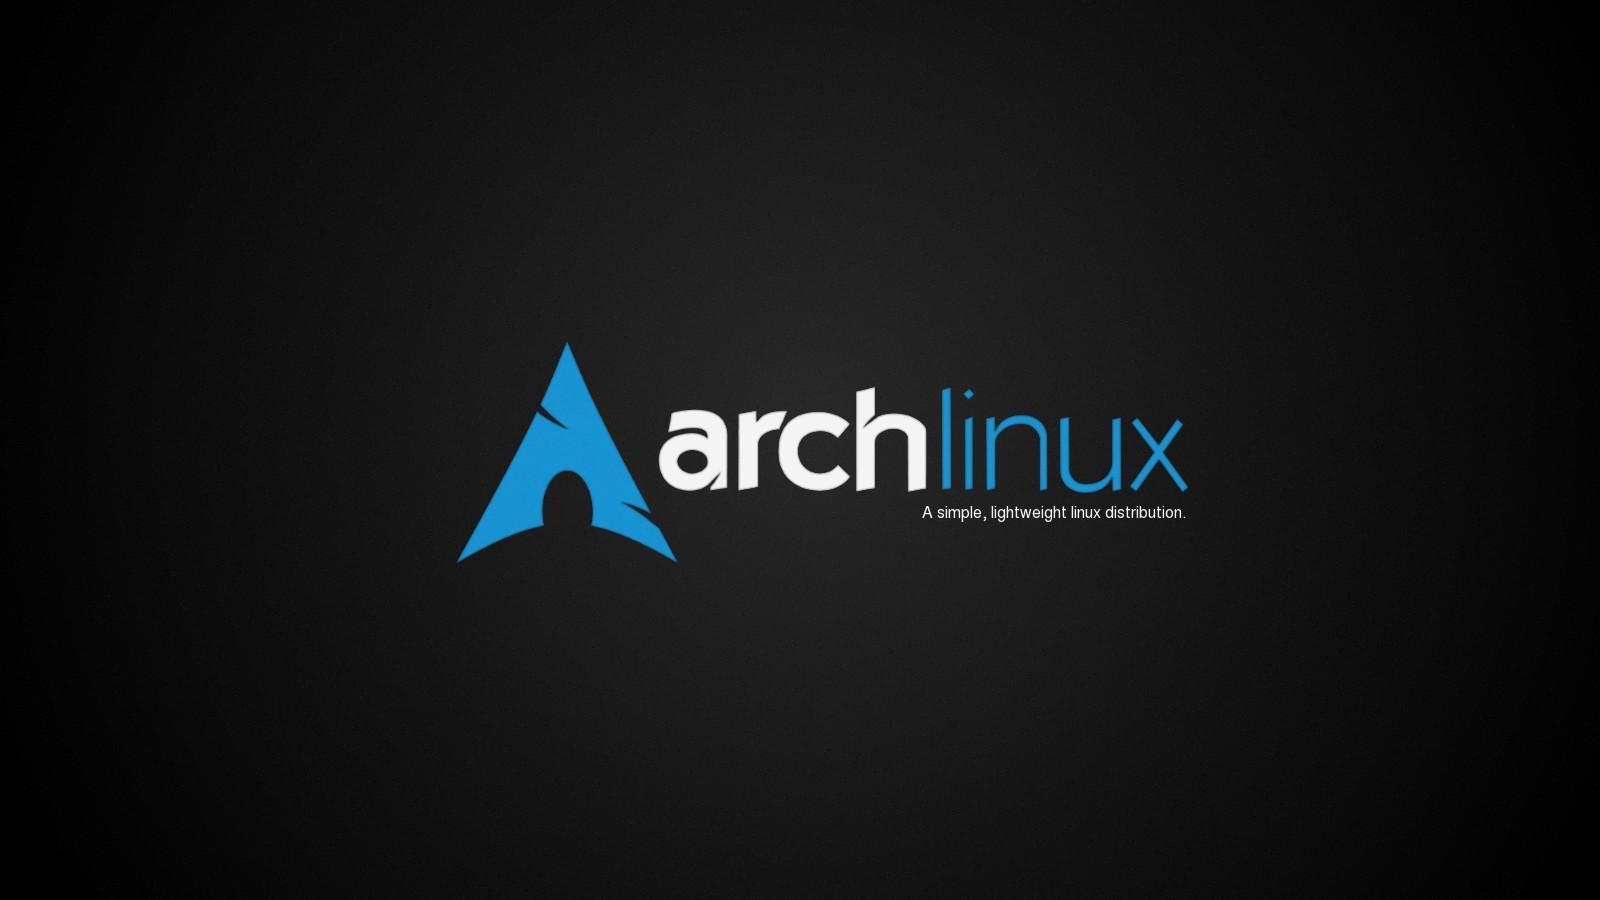 arch linux wallpaper 02 - [1600x900]